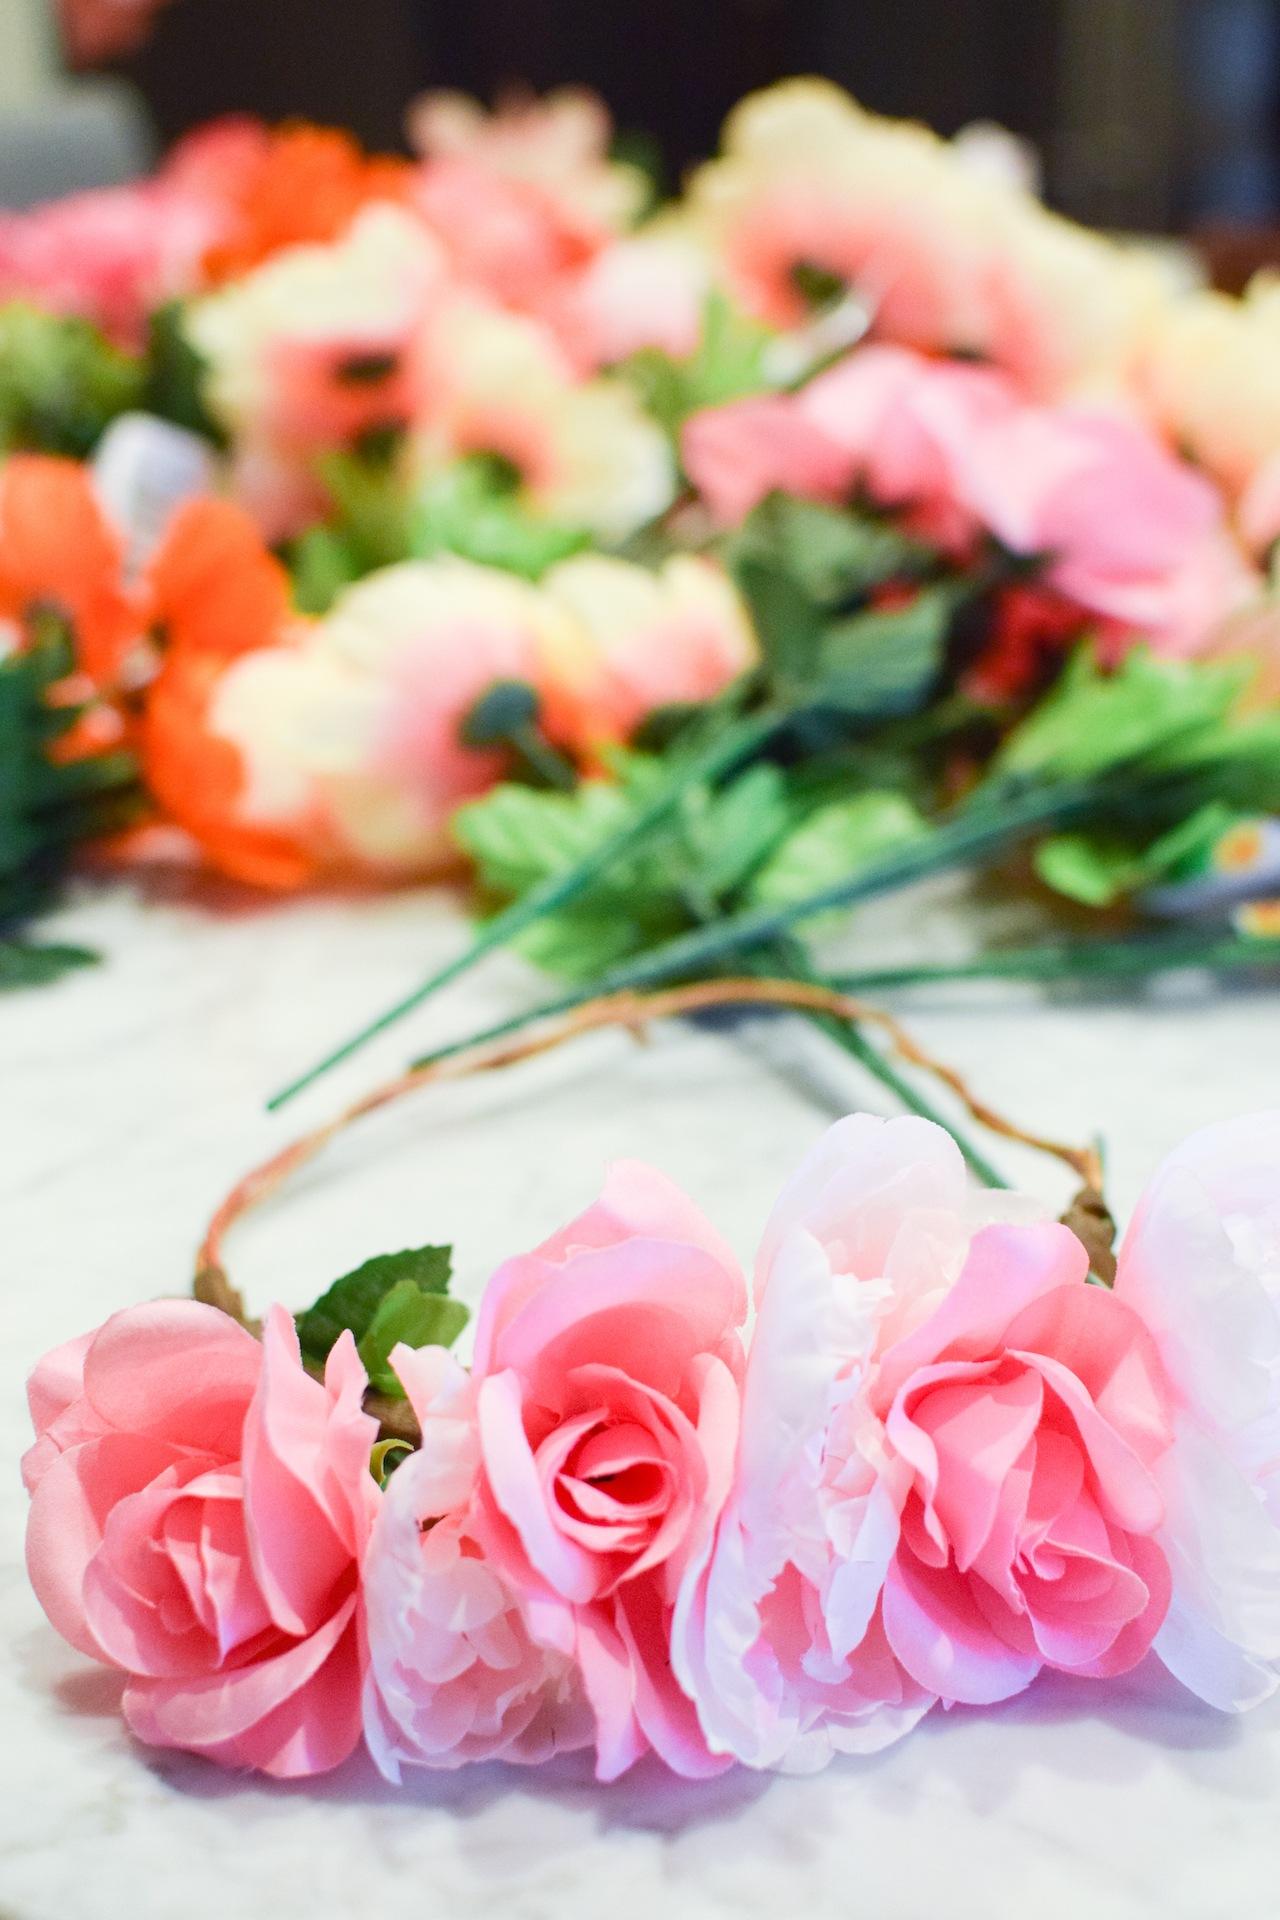 5 fun ideas for a bachelorette party